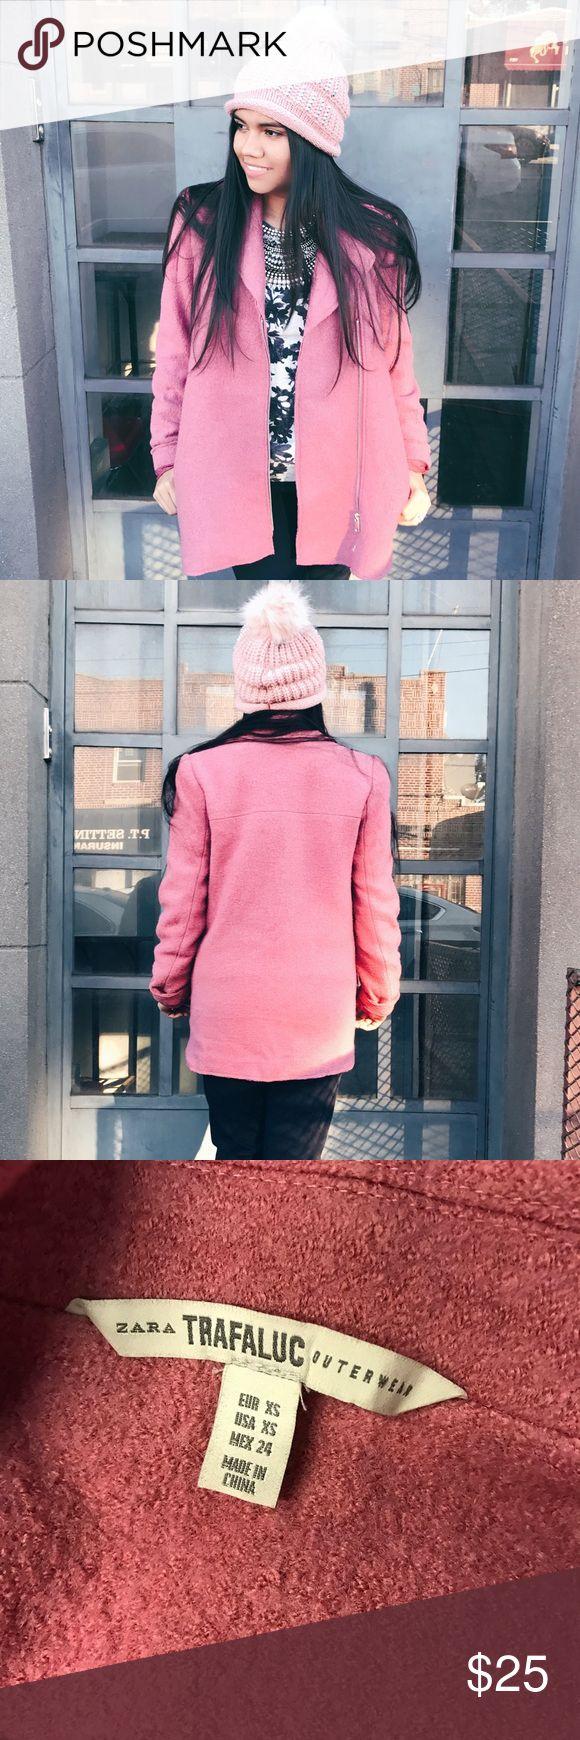 Zara jacket Sz XS Zara jacket. Sz XS. Great condition. Zara Jackets & Coats